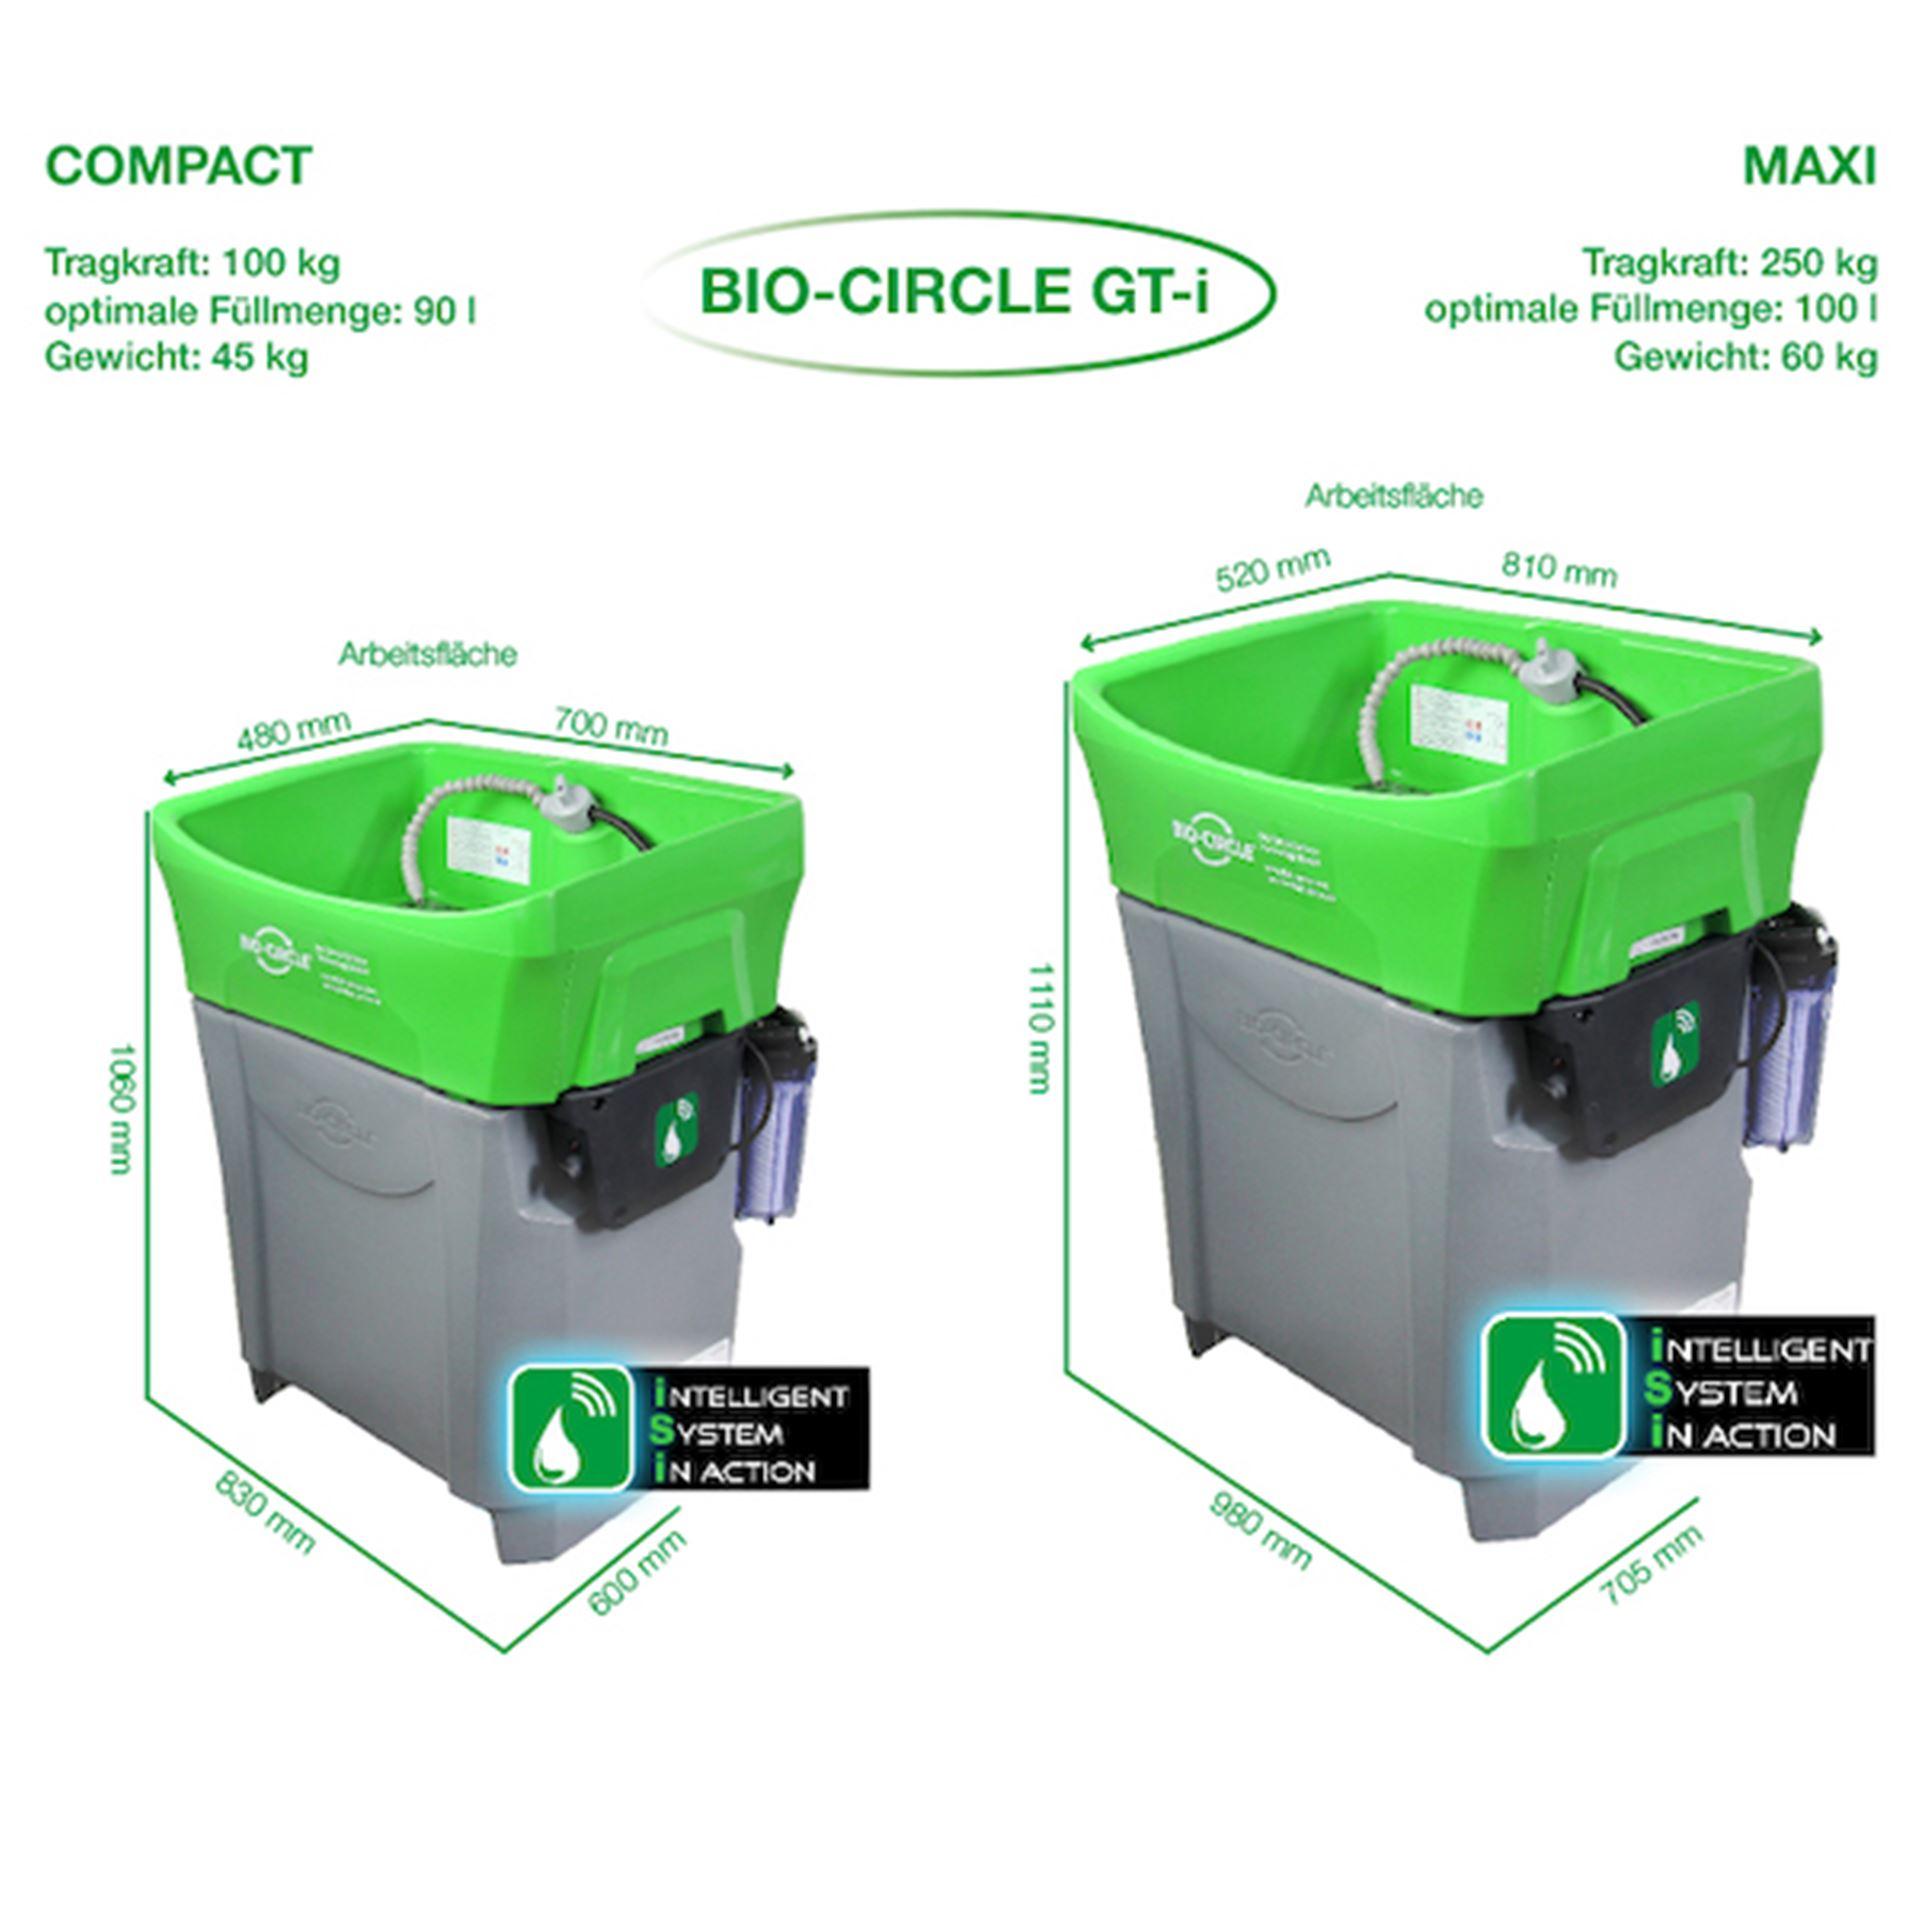 BIO-CIRCLE GT-i Compact und BIO-CIRCLE GT-i Maxi